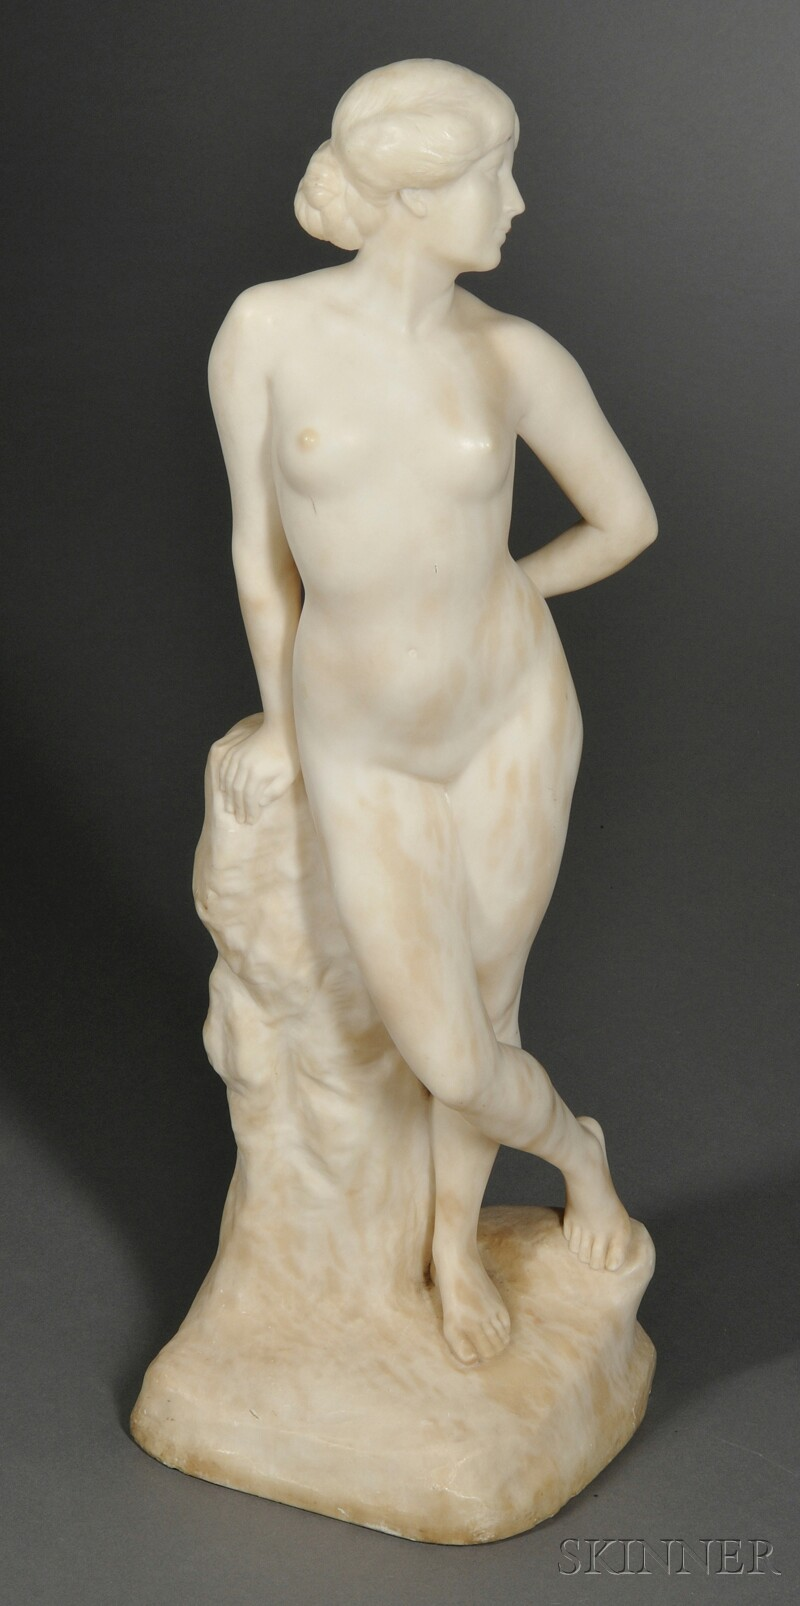 Alabaster Figure of a Nude Woman